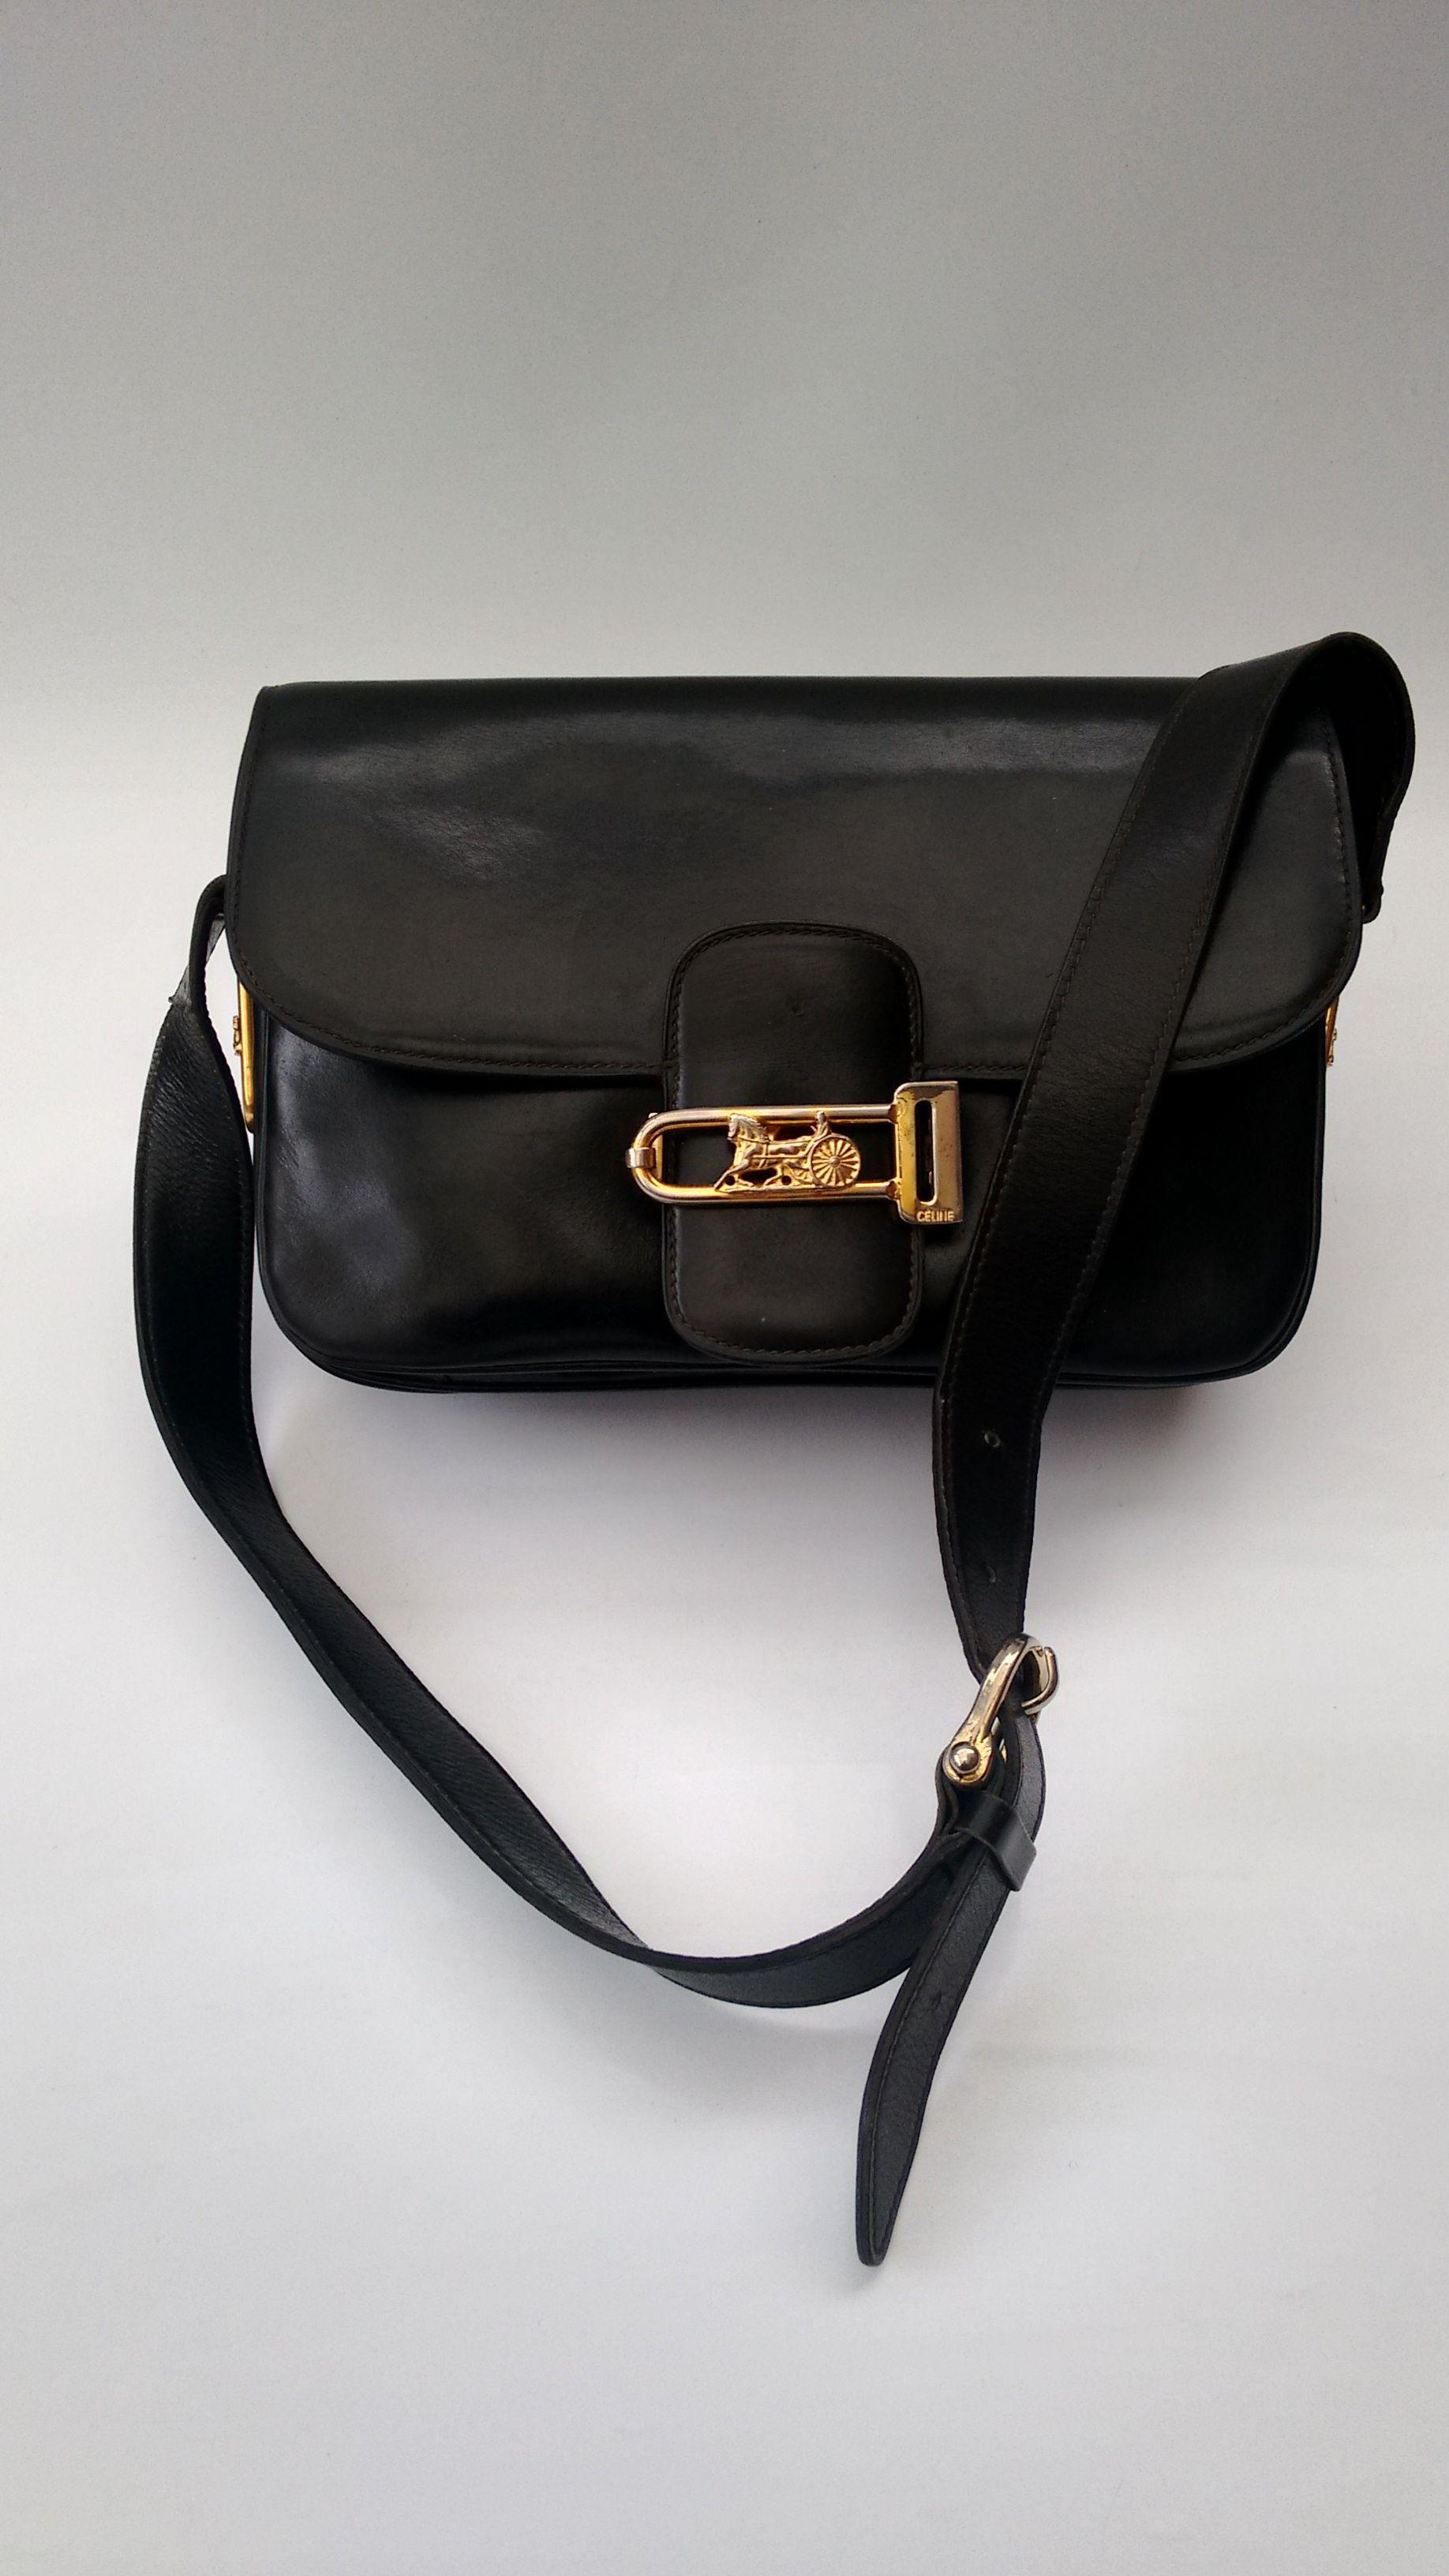 CELINE Bag. Céline Vintage Black Leather Box Horse Carriage bag Bag. French  designer purse. a93ad446d045b